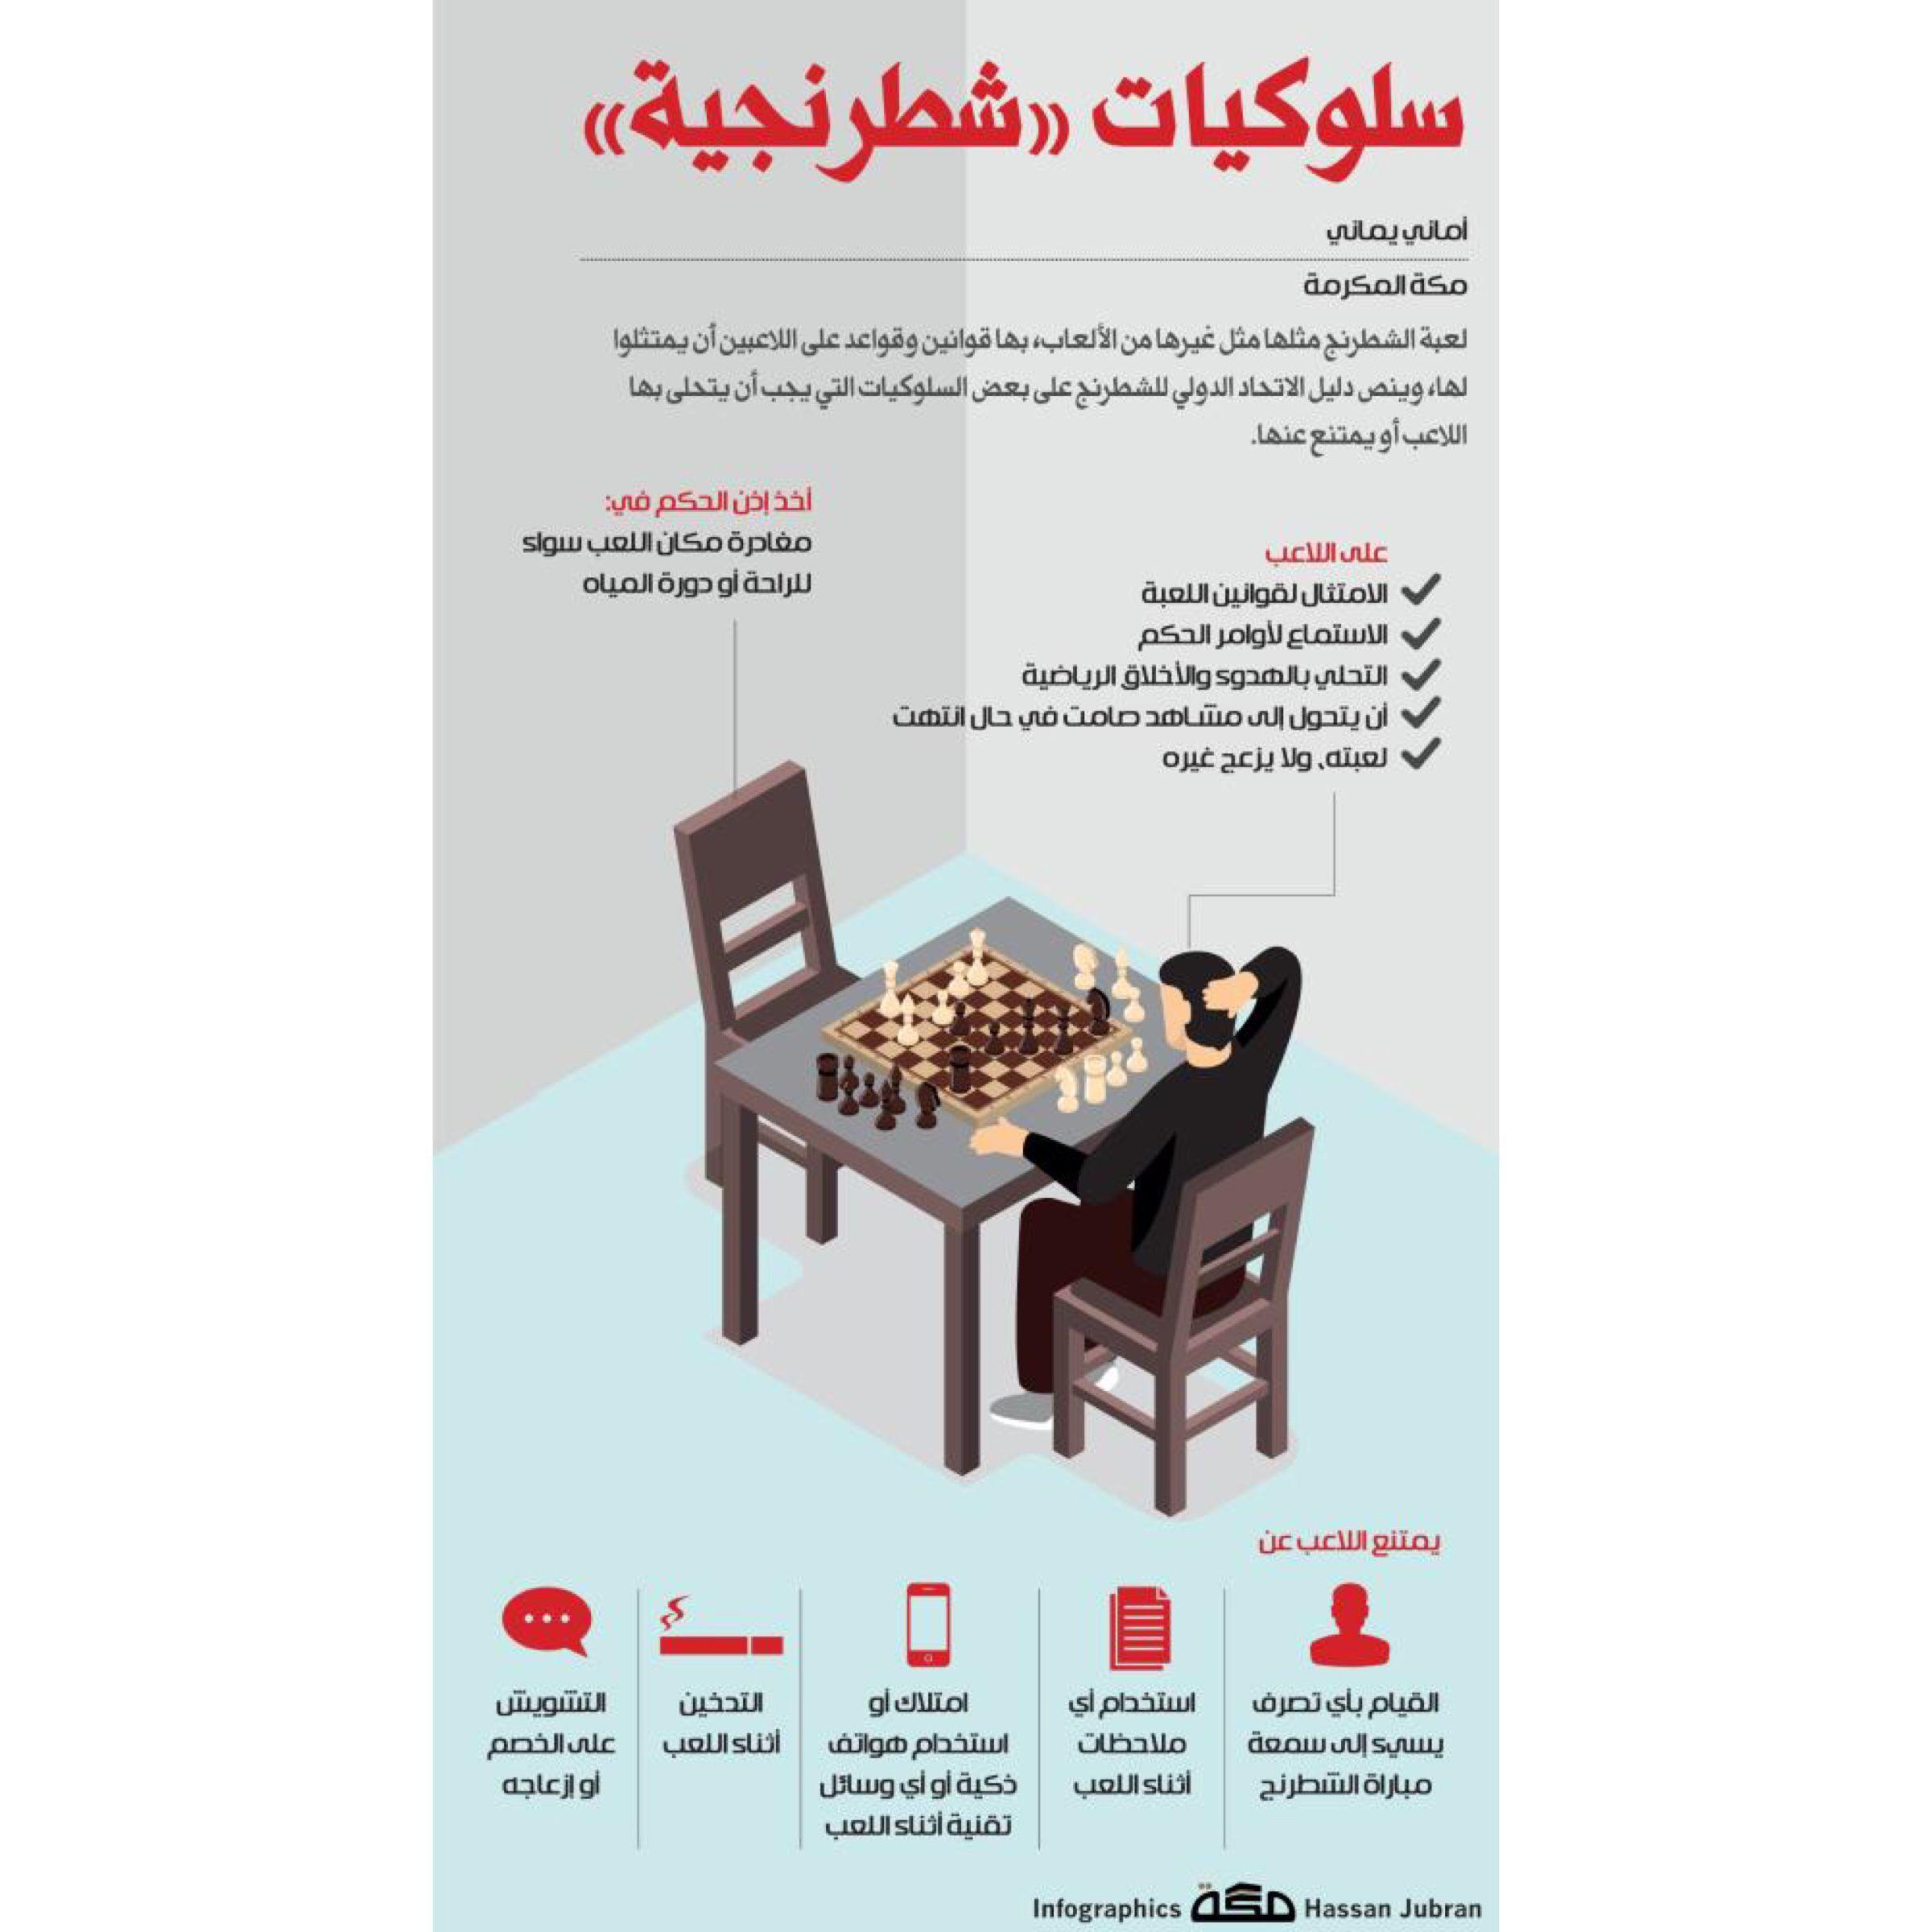 سلوكيات شطرنجية انفوجرافيك جراف صحيفة مكة Infographic Makkahnp Infographic Aic Shopping